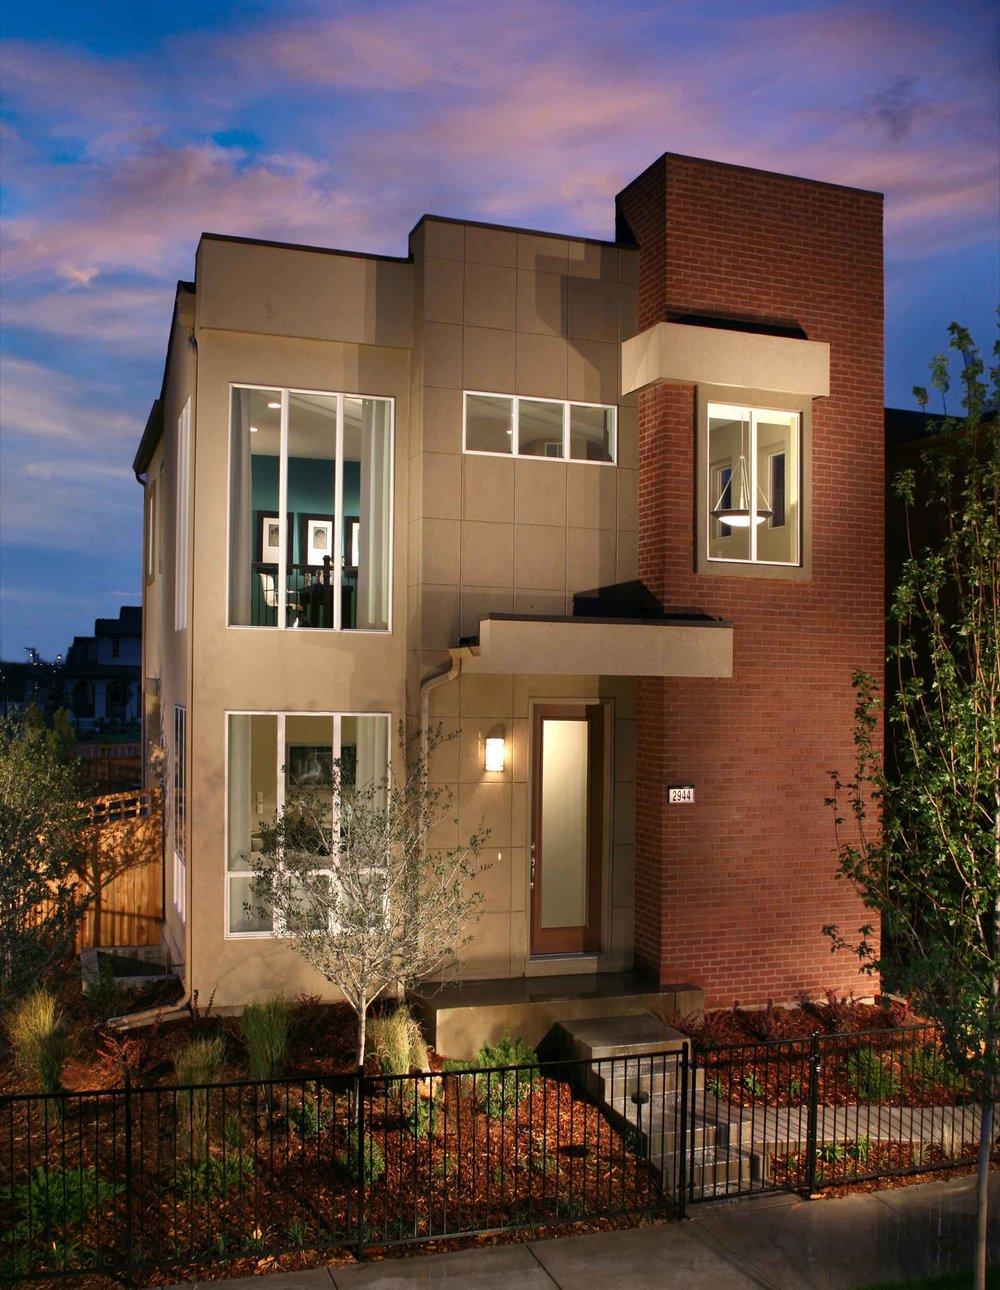 Balboa at Stapleton   | Denver, Colorado    AWARDS  +  2008 Denver BAR Award  for Best Detached Home Priced Over $600,000